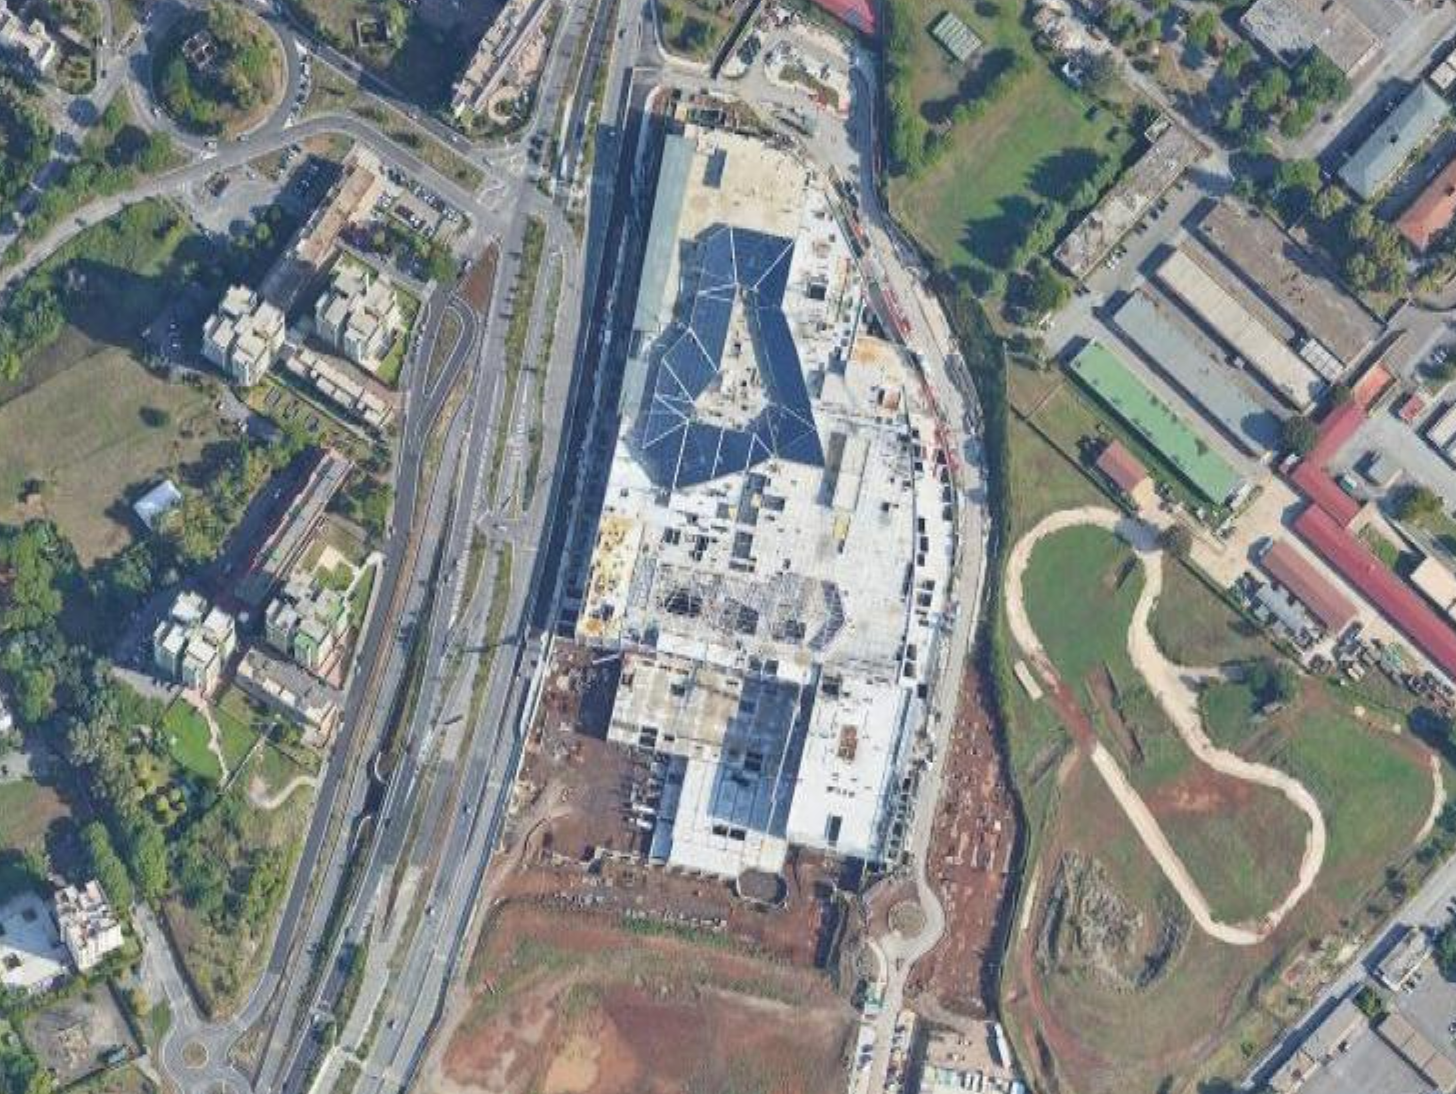 centro commerciale maximo maps 22 9 2020